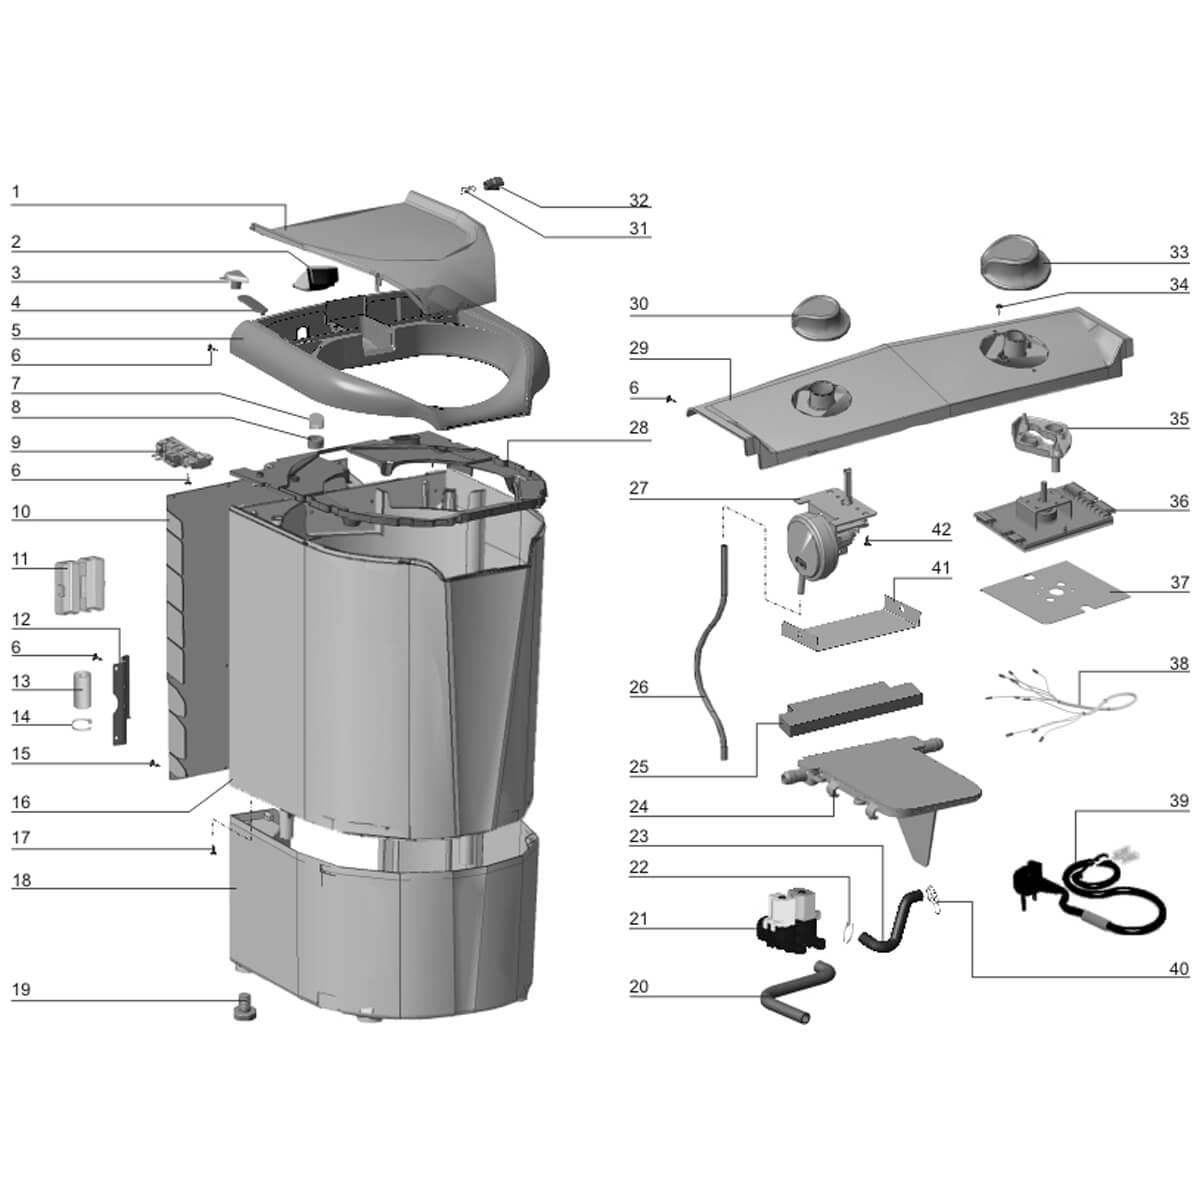 Placa Eletrônica Para Lavadora De Roupas Electrolux Ltc07 - 70200562 A99021902